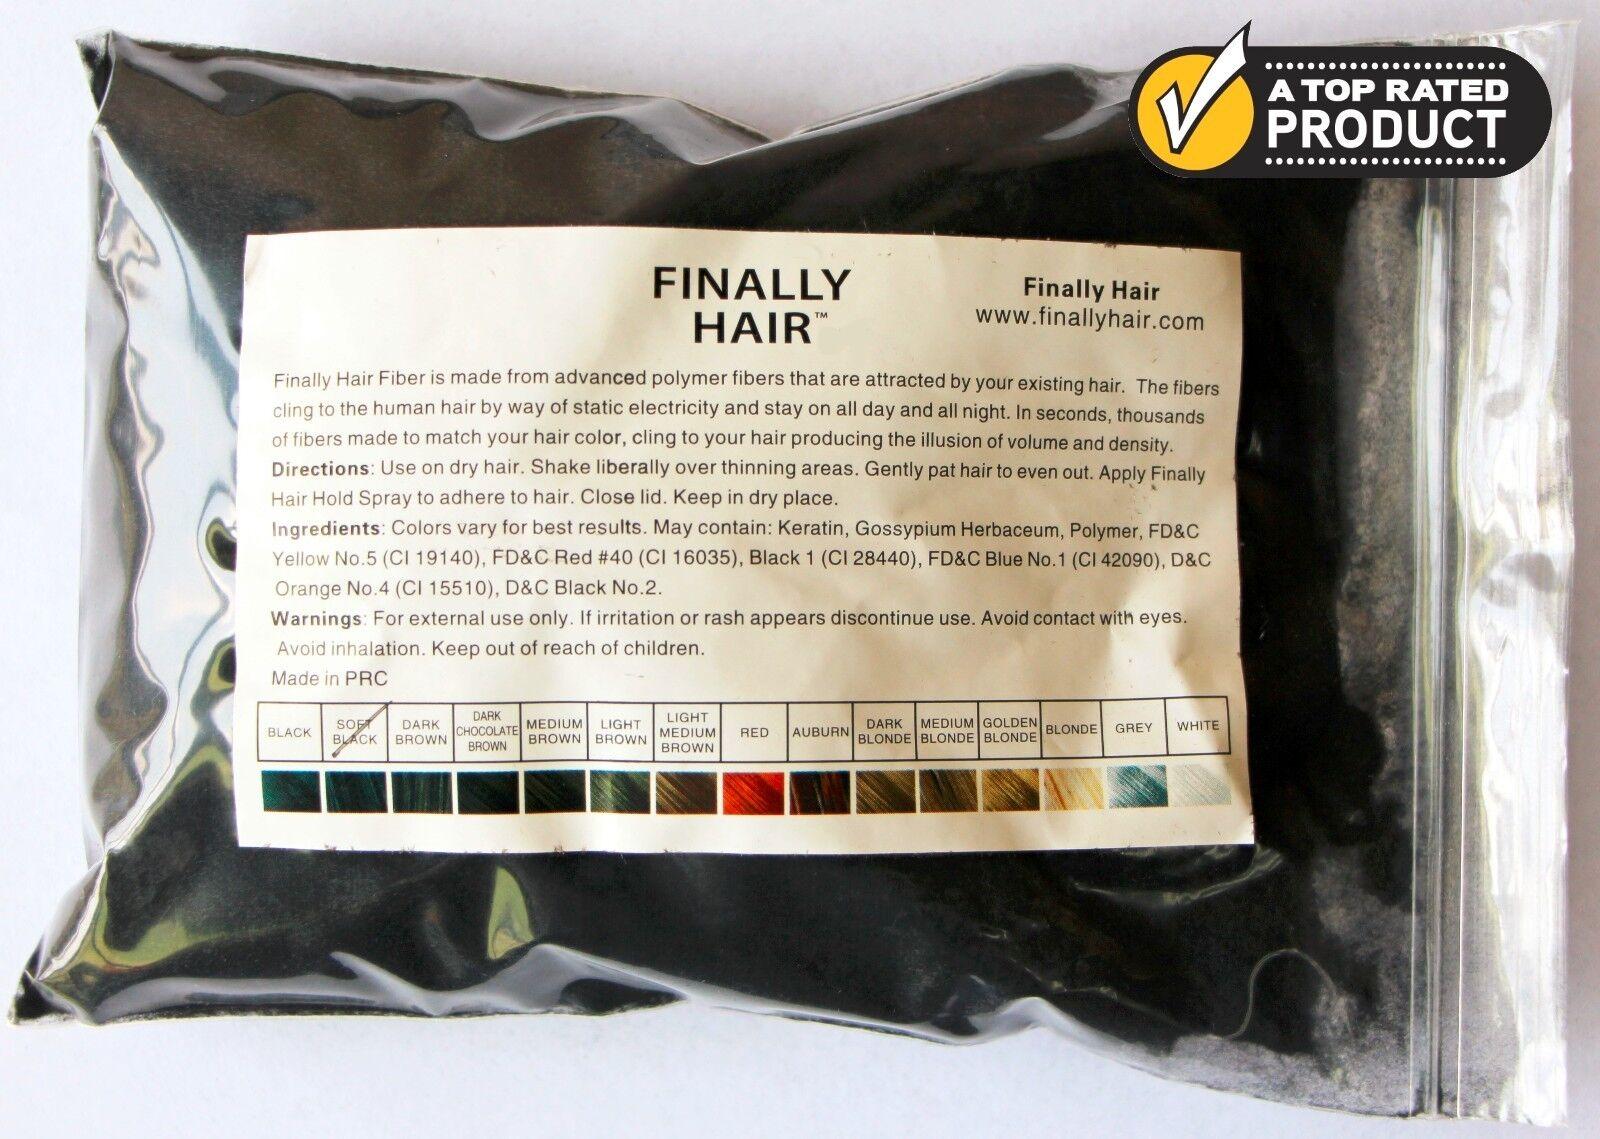 Keratin Hair Building Fibers 57g Refill Hair Loss Concealer 25750+ SOLD ON EBAY!